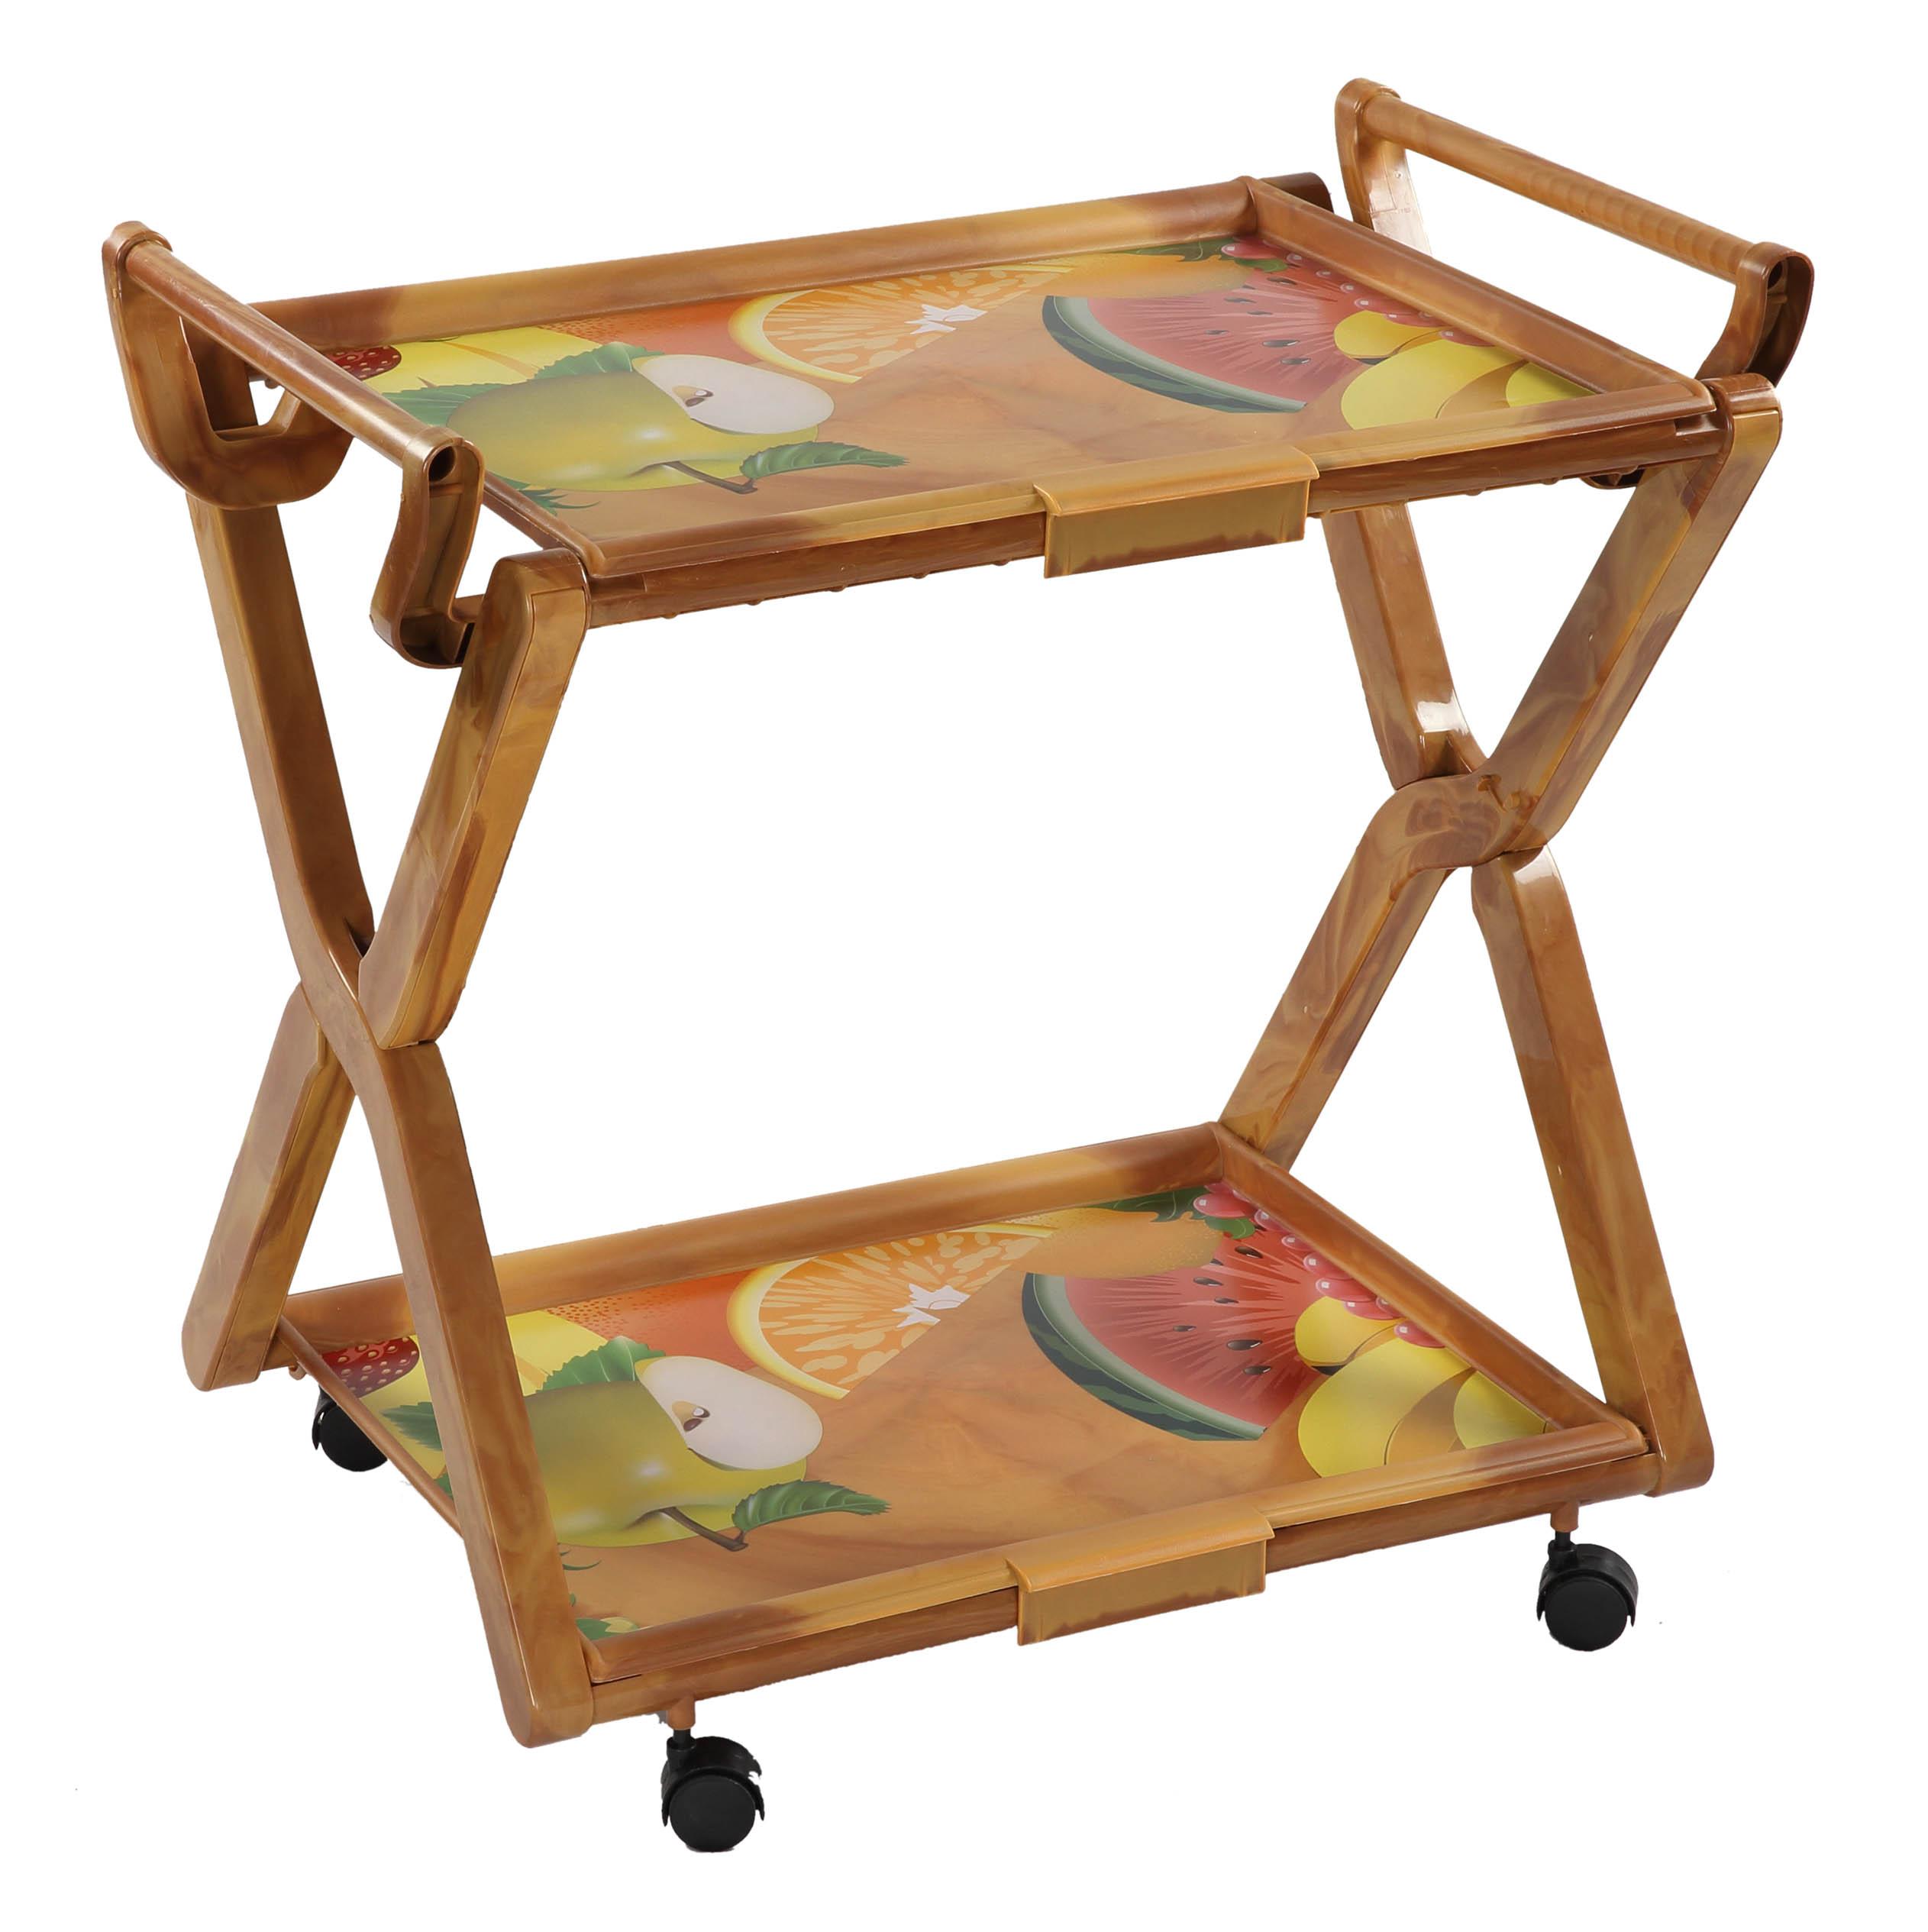 Royal Folding Tea Table Printed Hello Fly-E.Brown